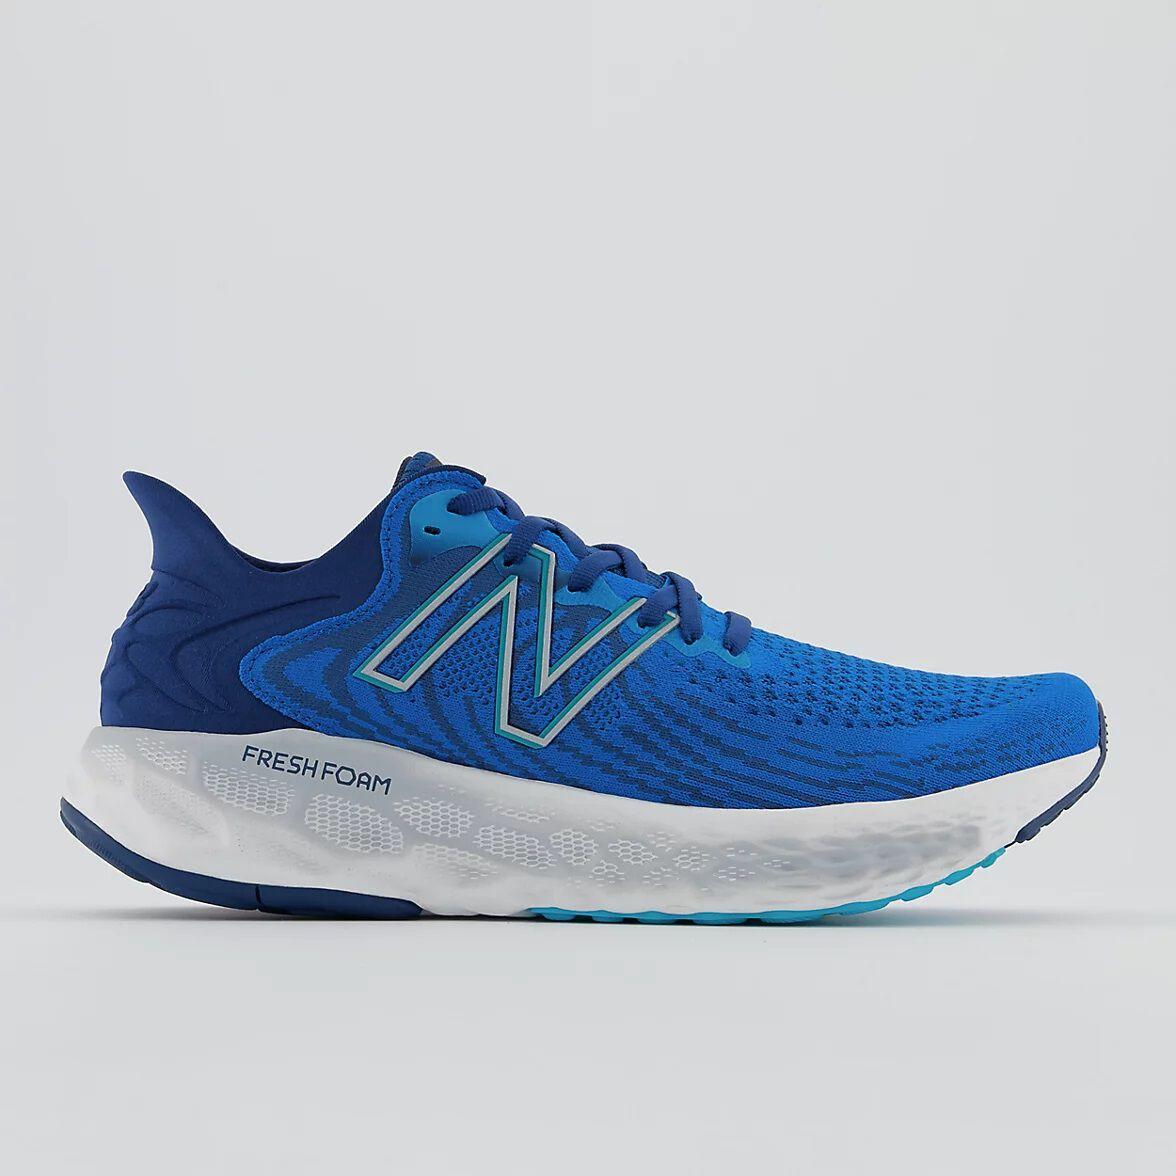 New Balance® Chaussures & Vêtements   Site Officiel - New Balance